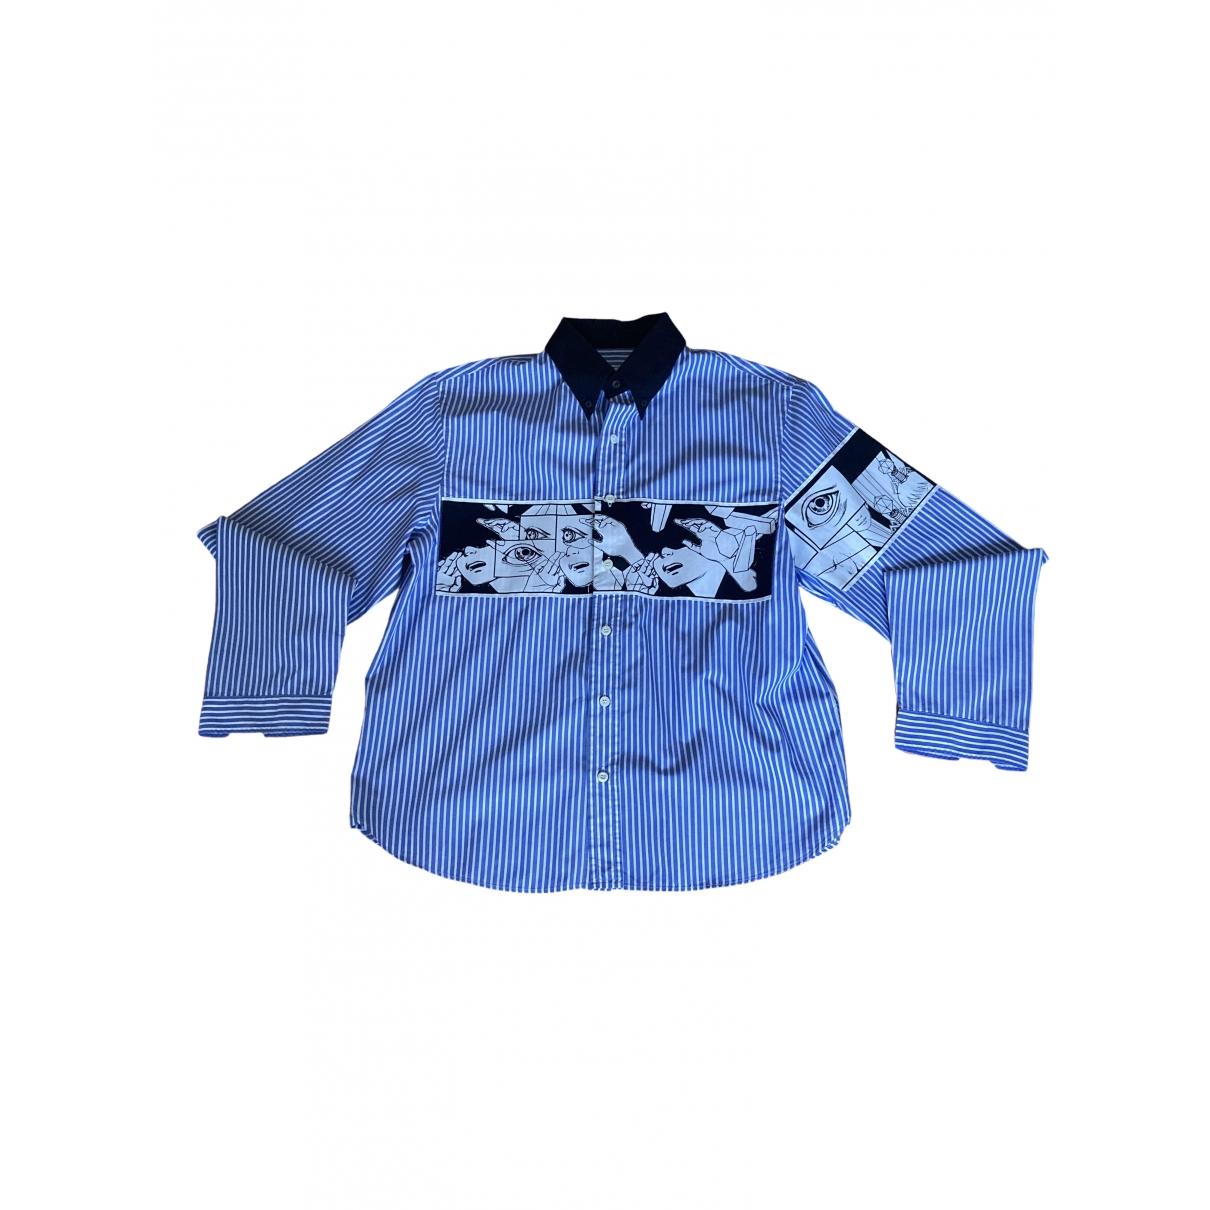 Prada \N Multicolour Cotton Shirts for Men L International